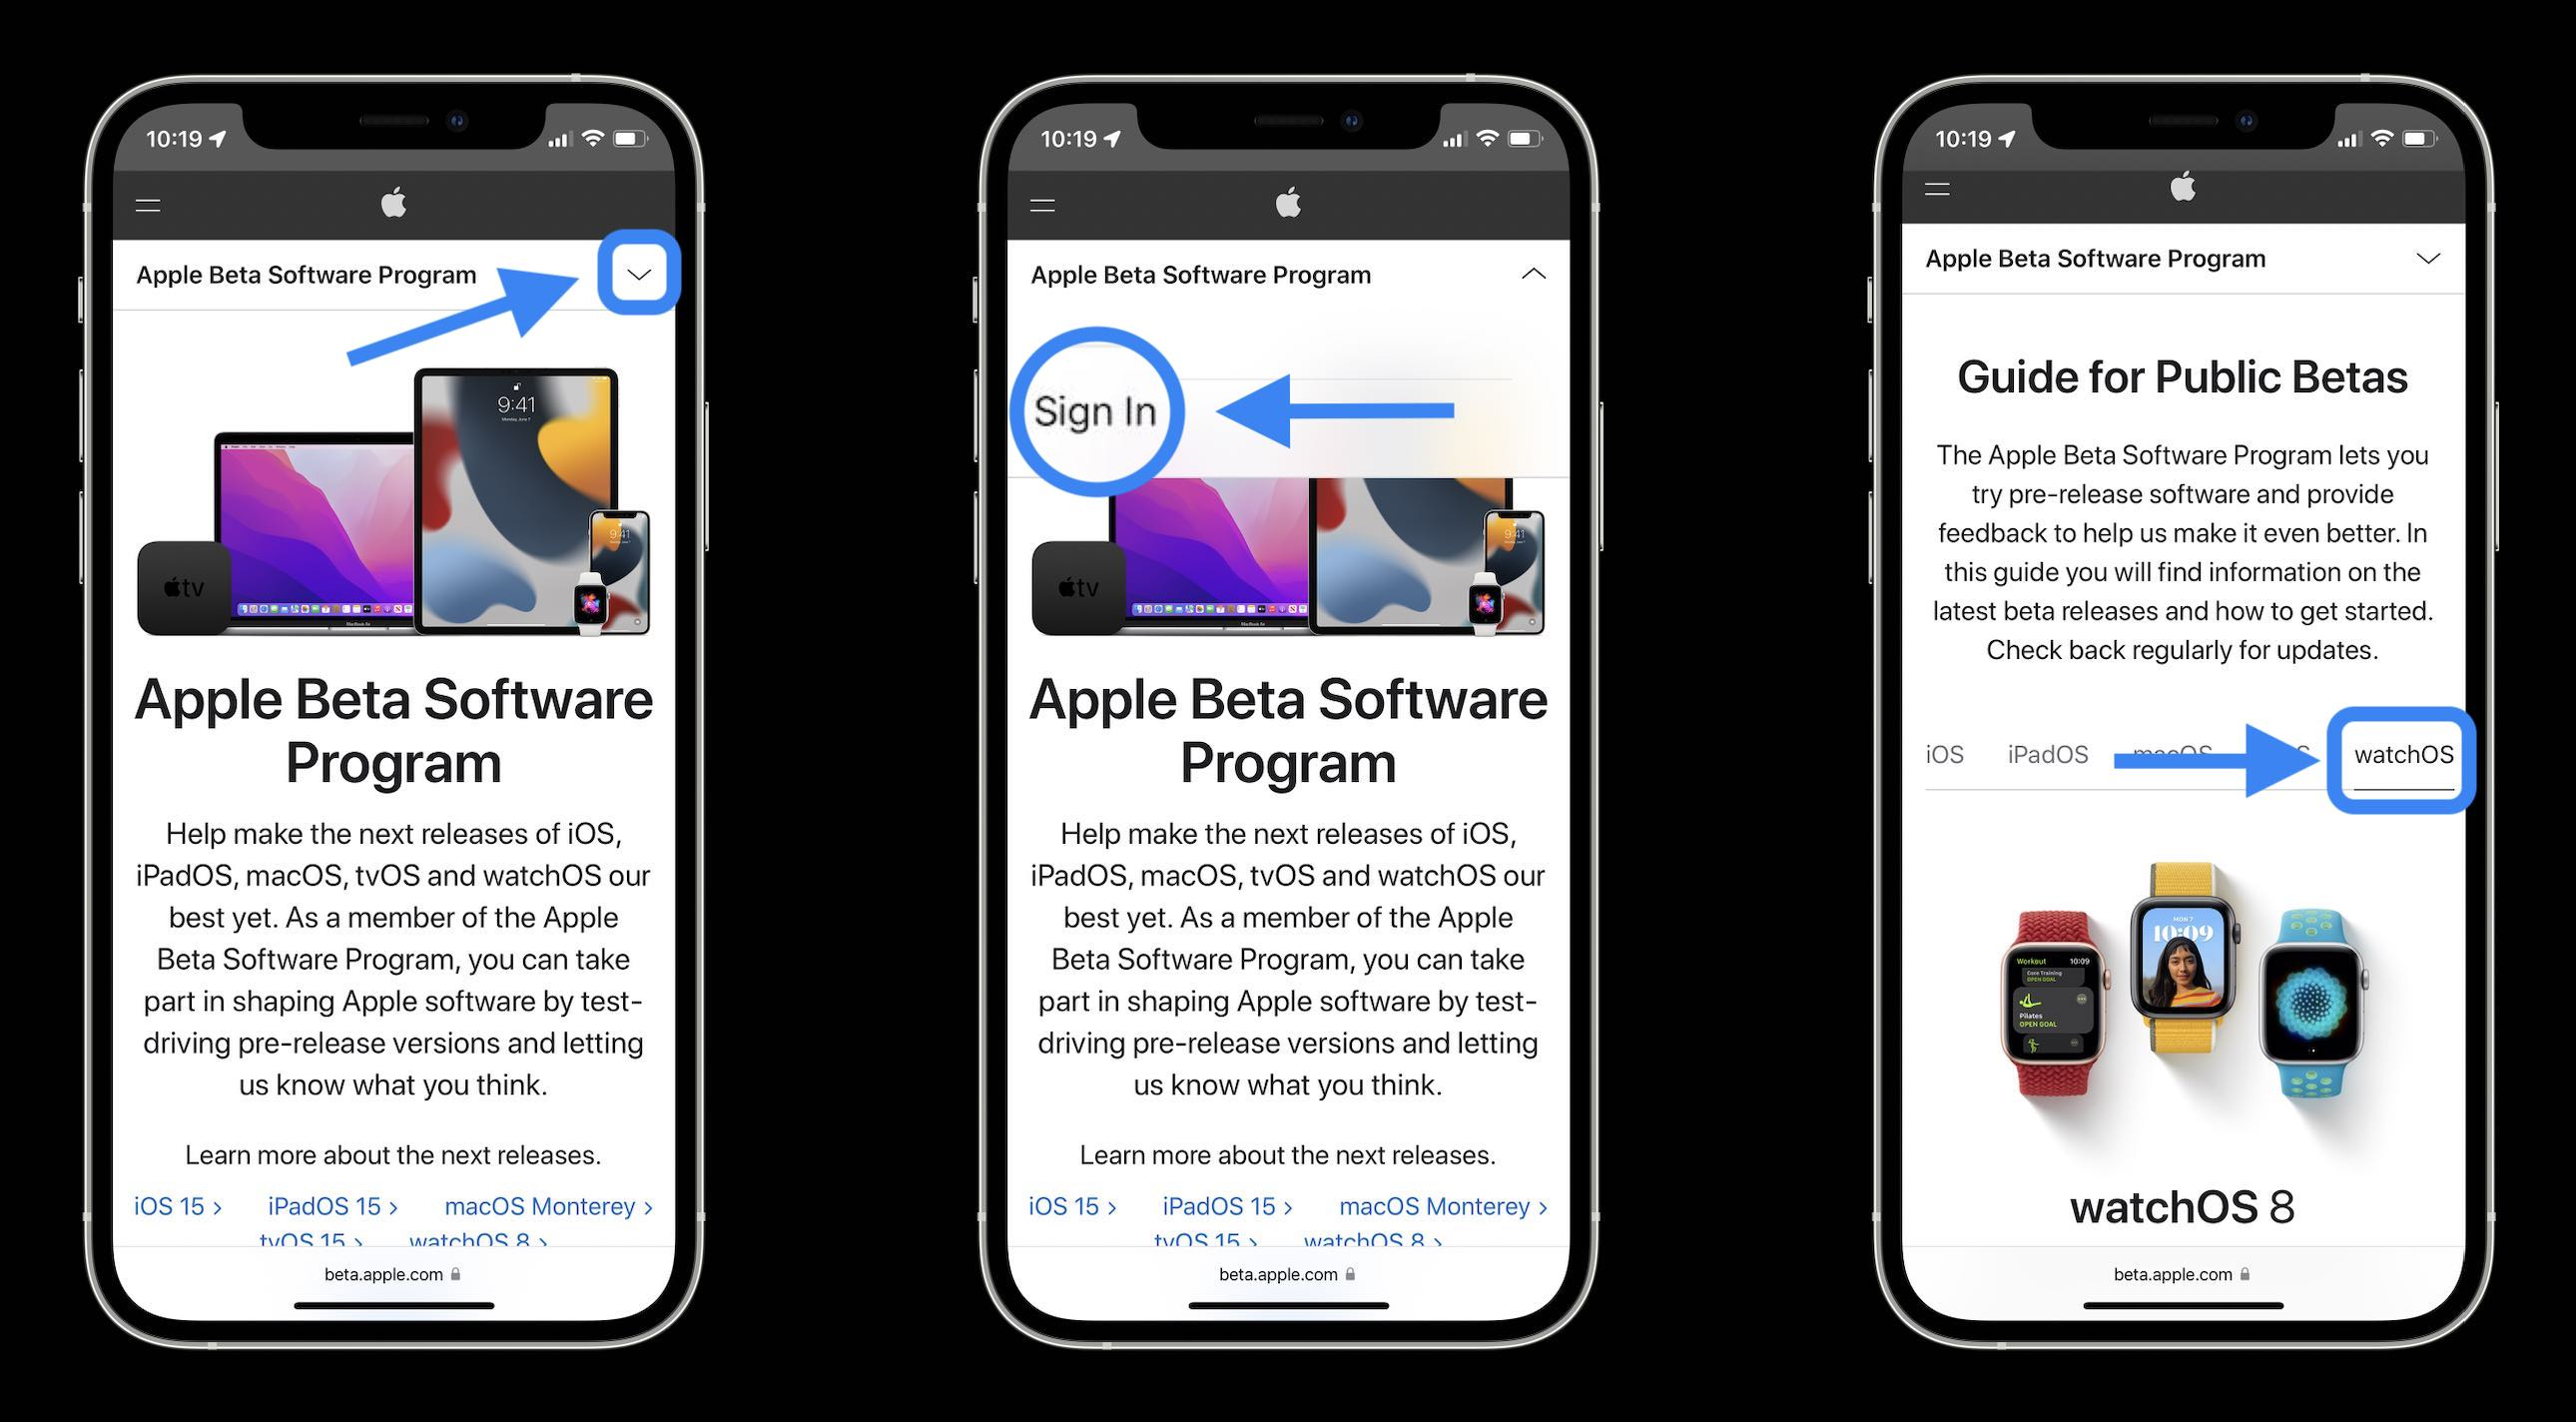 How to install watchOS 8 beta walkthrough 1 - public beta